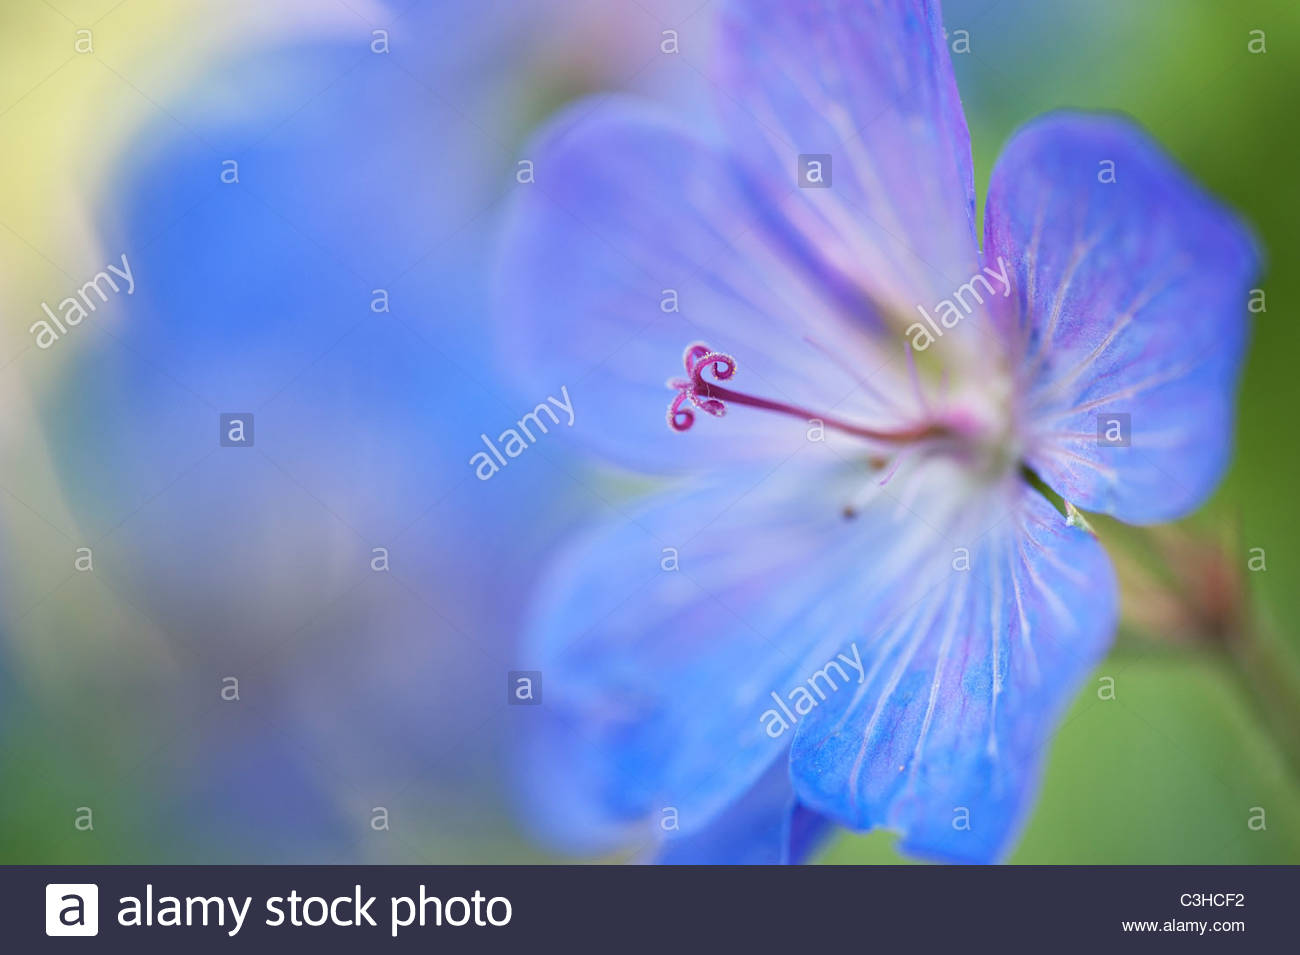 Geranium flower stock photos geranium flower stock images alamy geranium johnsons blue flower and bud selective focus stock image izmirmasajfo